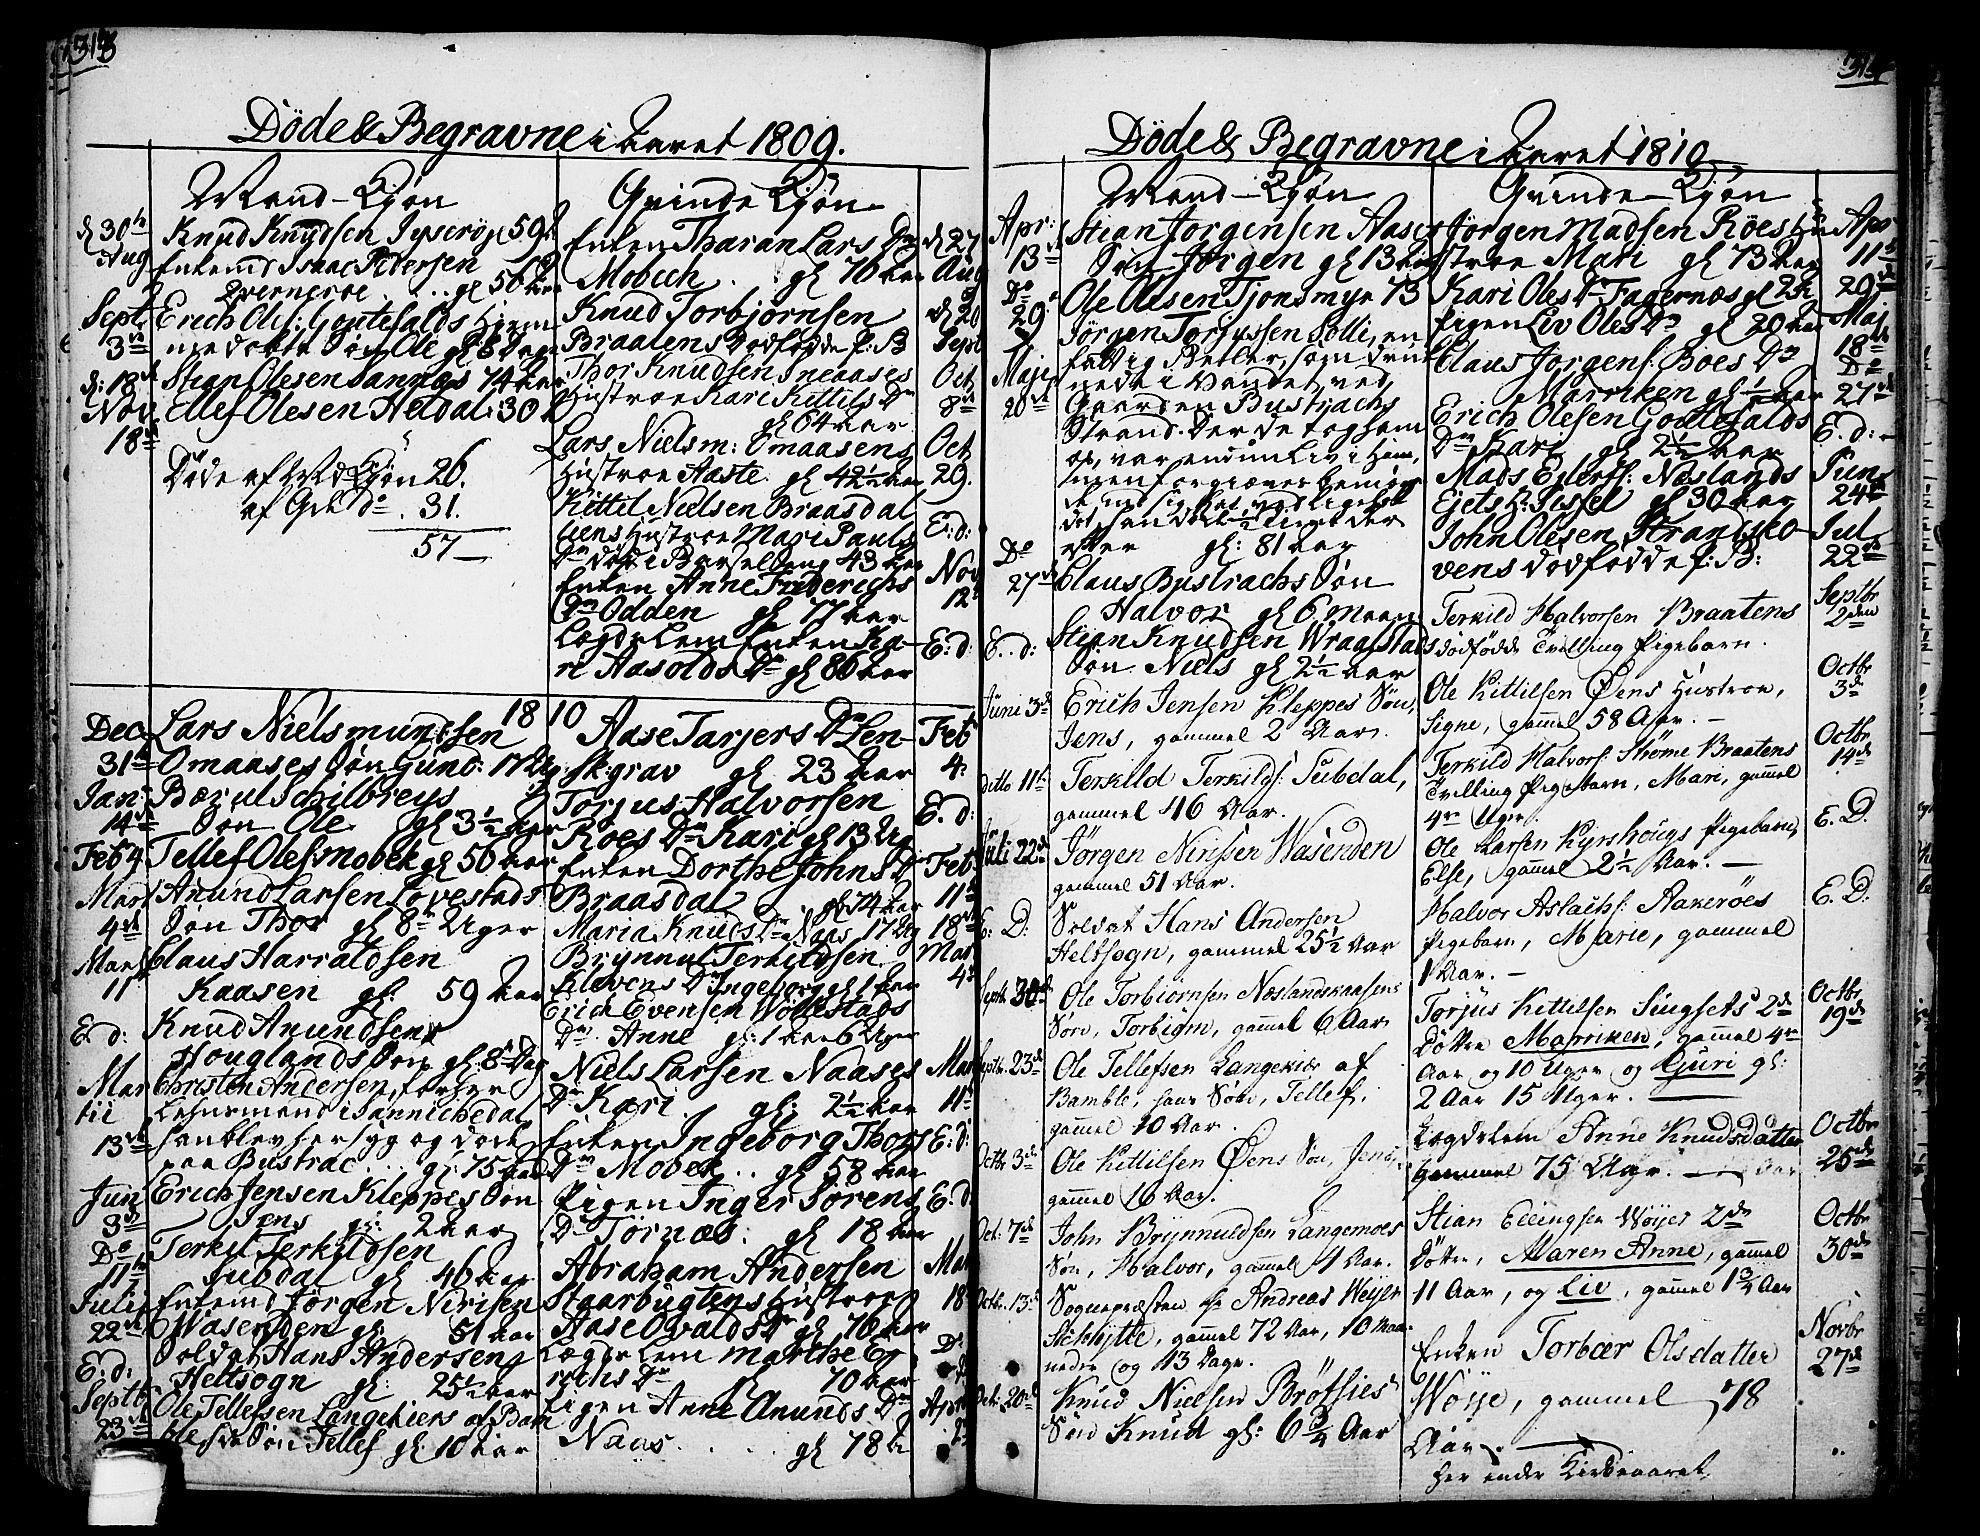 SAKO, Drangedal kirkebøker, F/Fa/L0003: Ministerialbok nr. 3, 1768-1814, s. 313-314